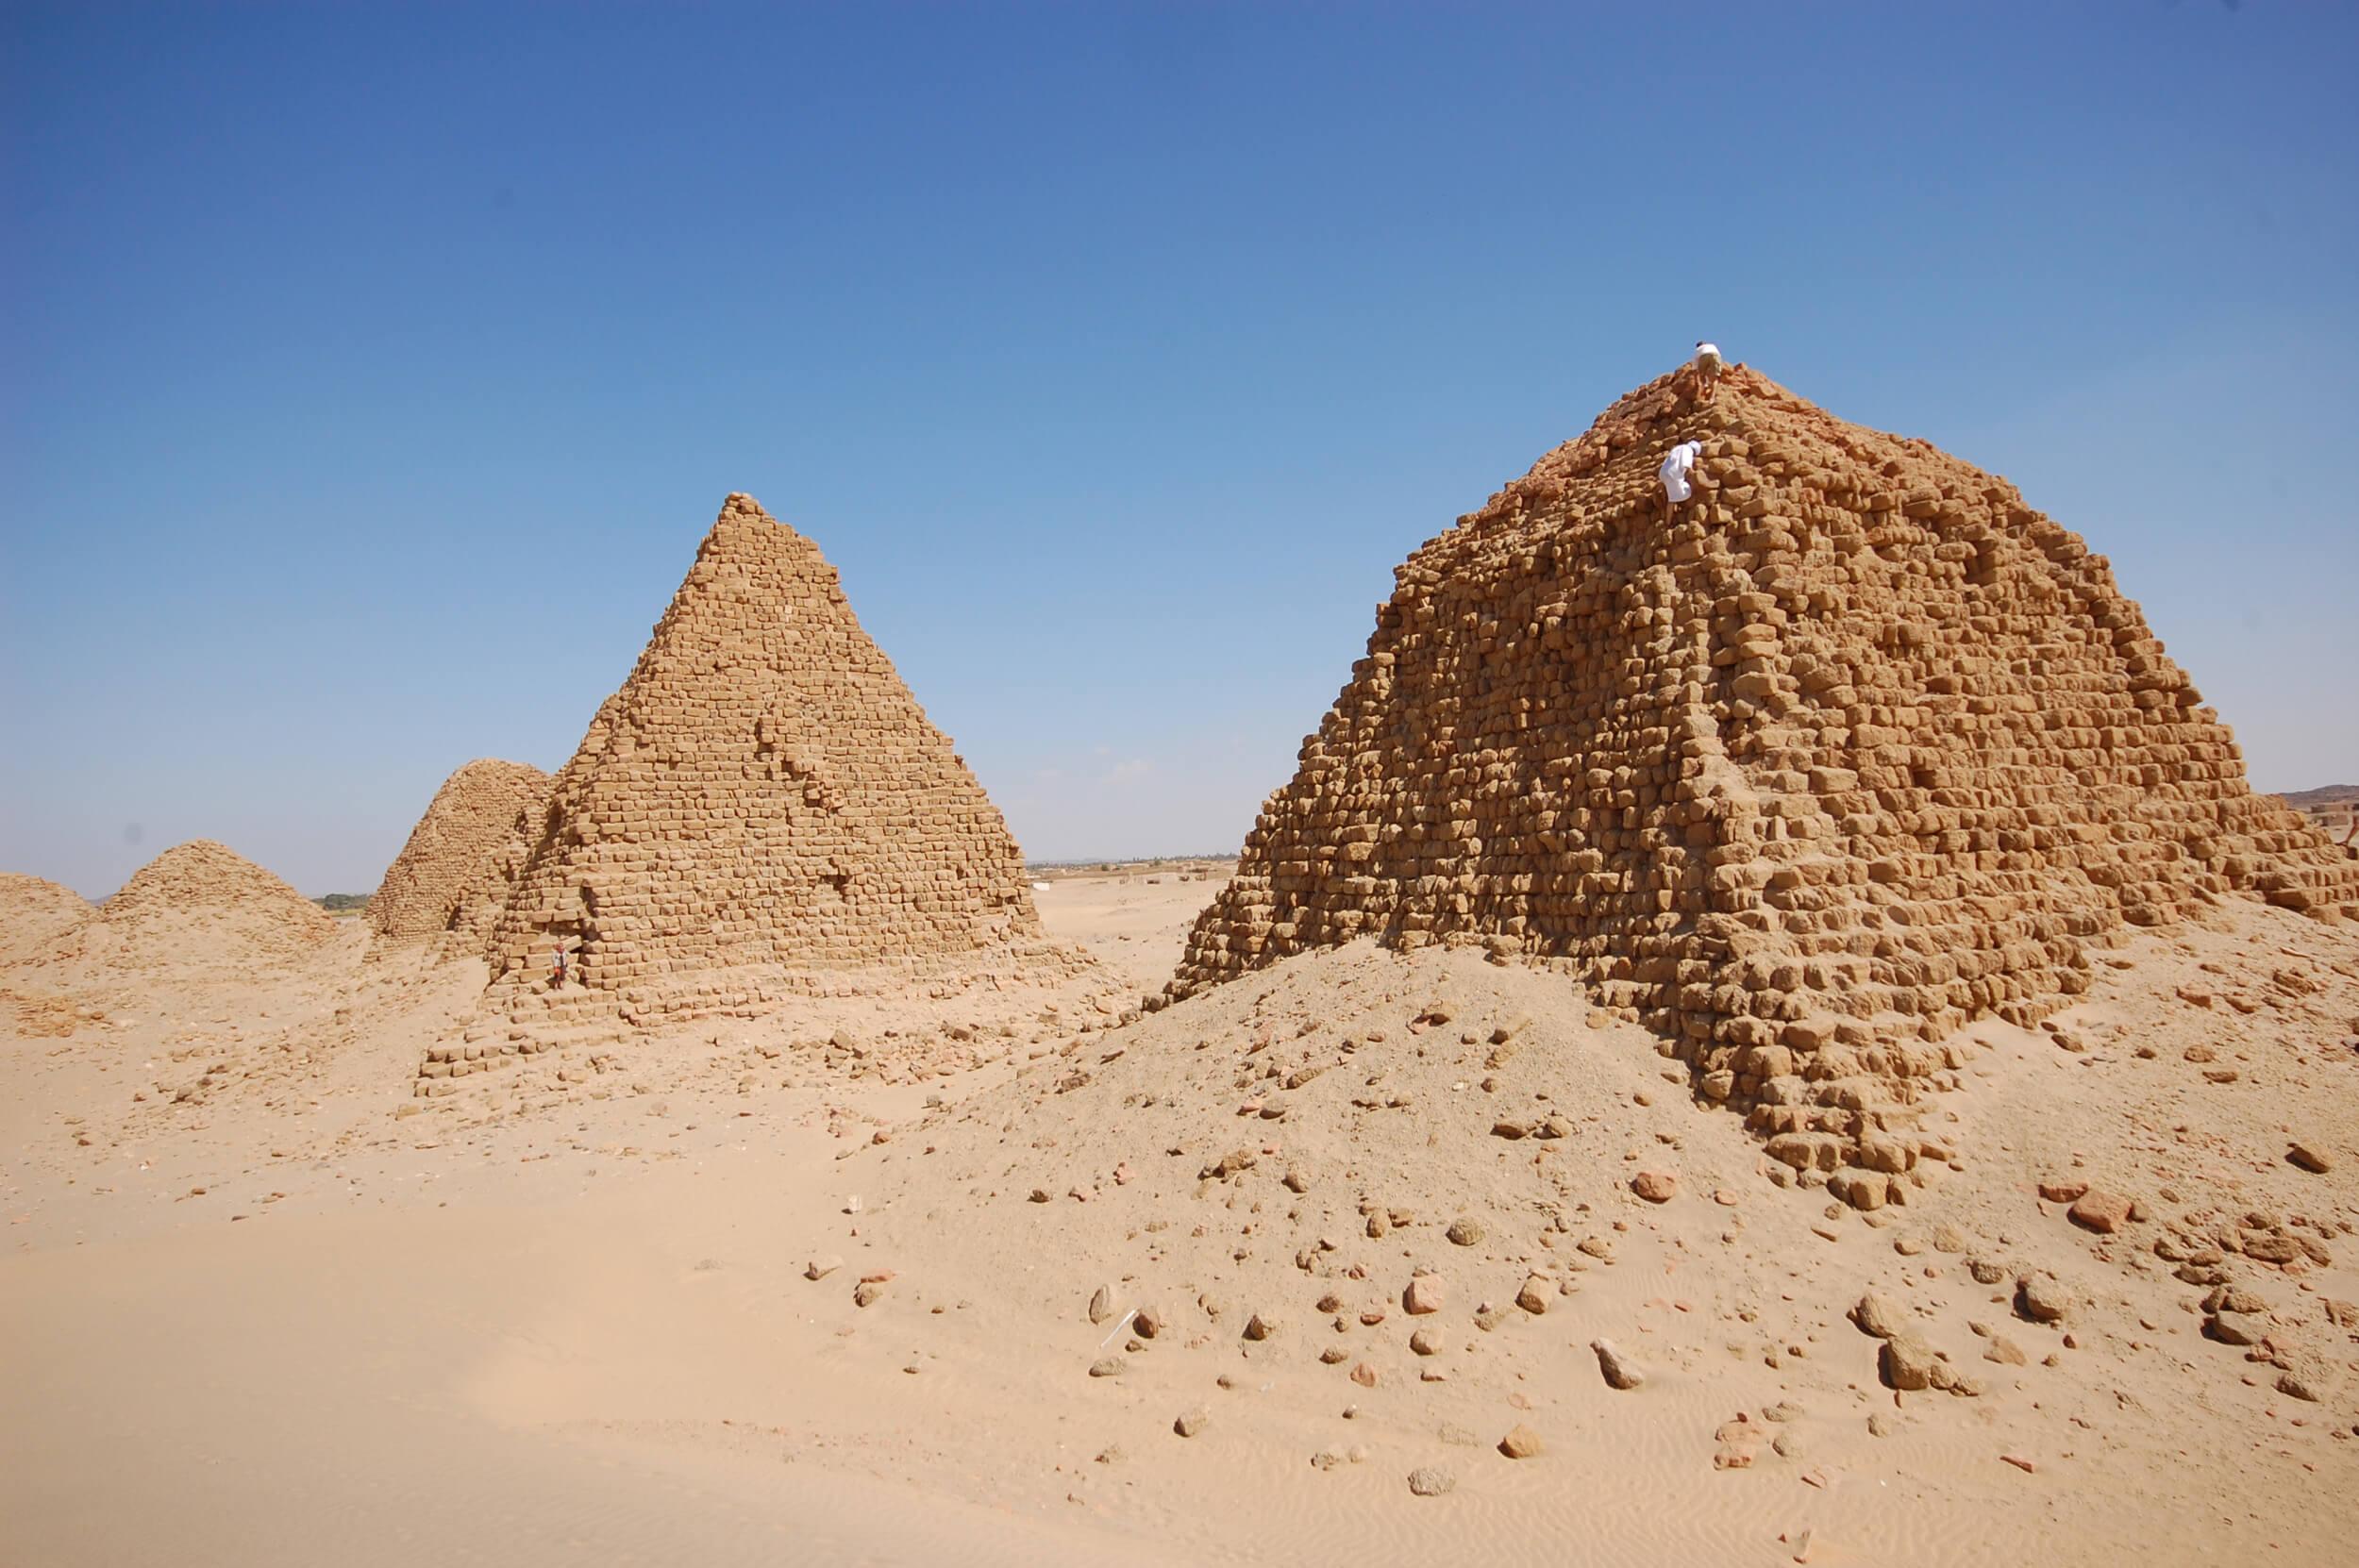 https://bubo.sk/uploads/galleries/7407/lubosfellner_sudan_6s-sudan-a-bubo-foto-exklusive.jpg